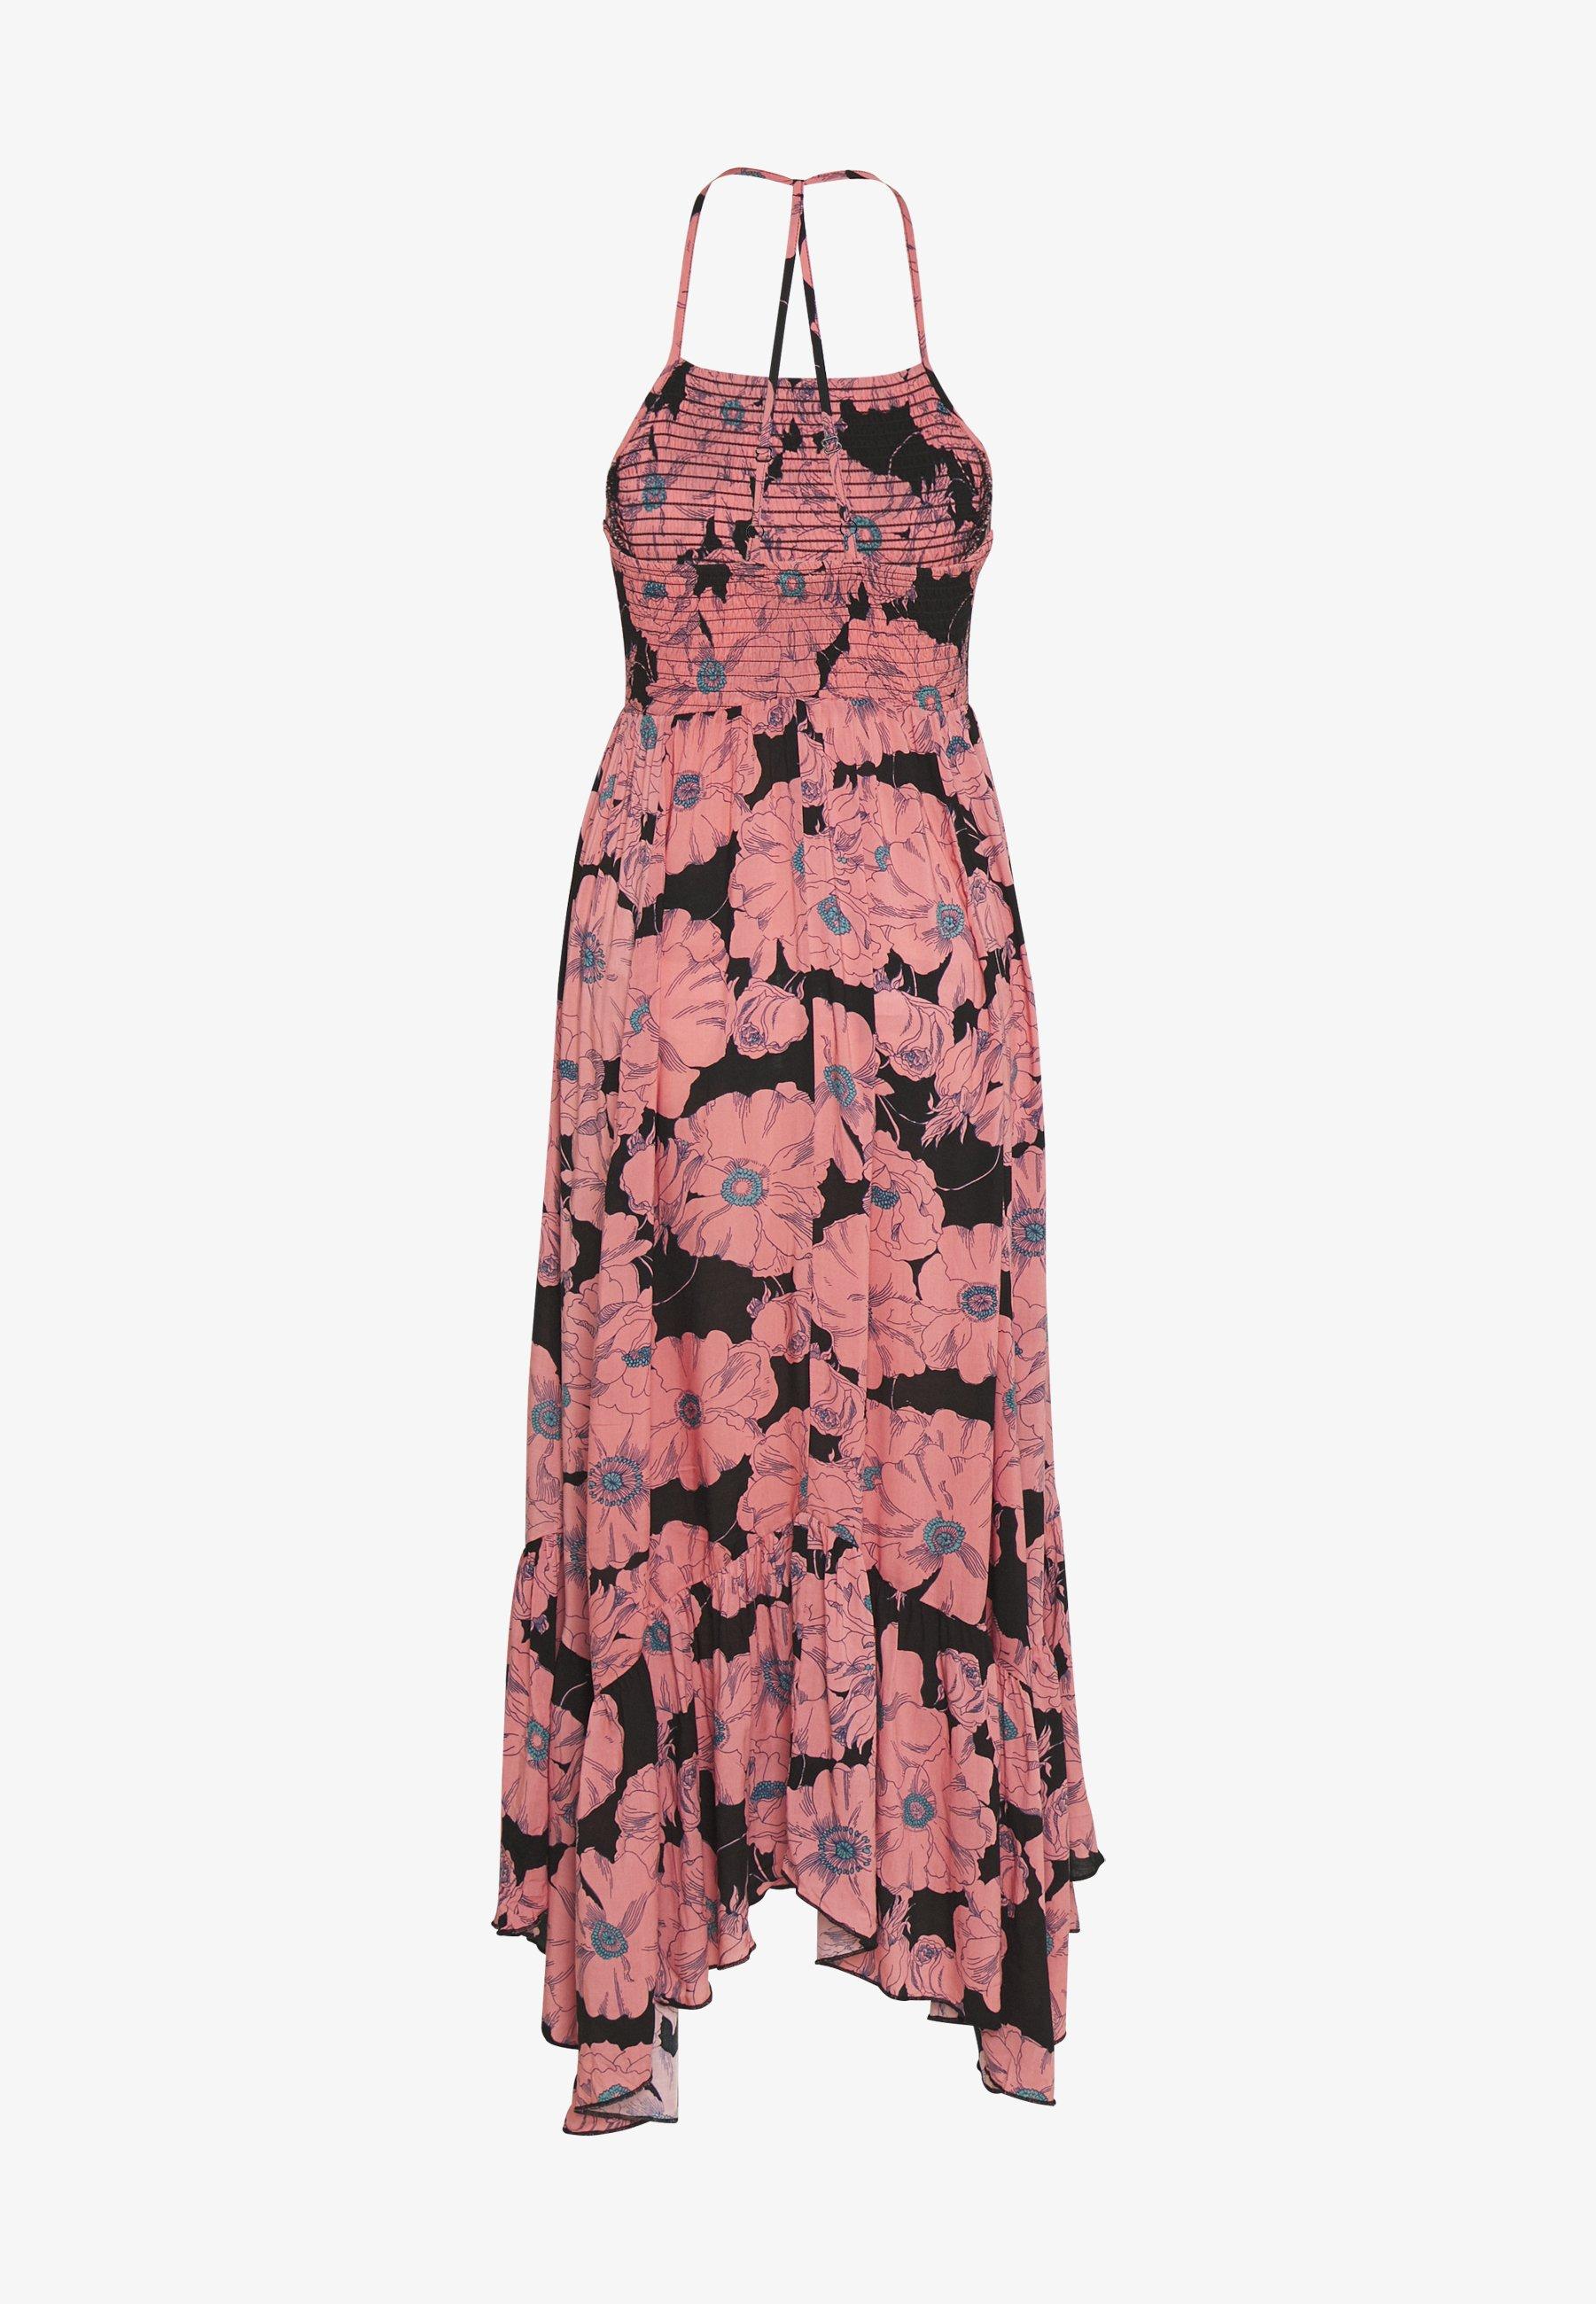 Free People Heatwave Printed Maxi - Dress Black UK